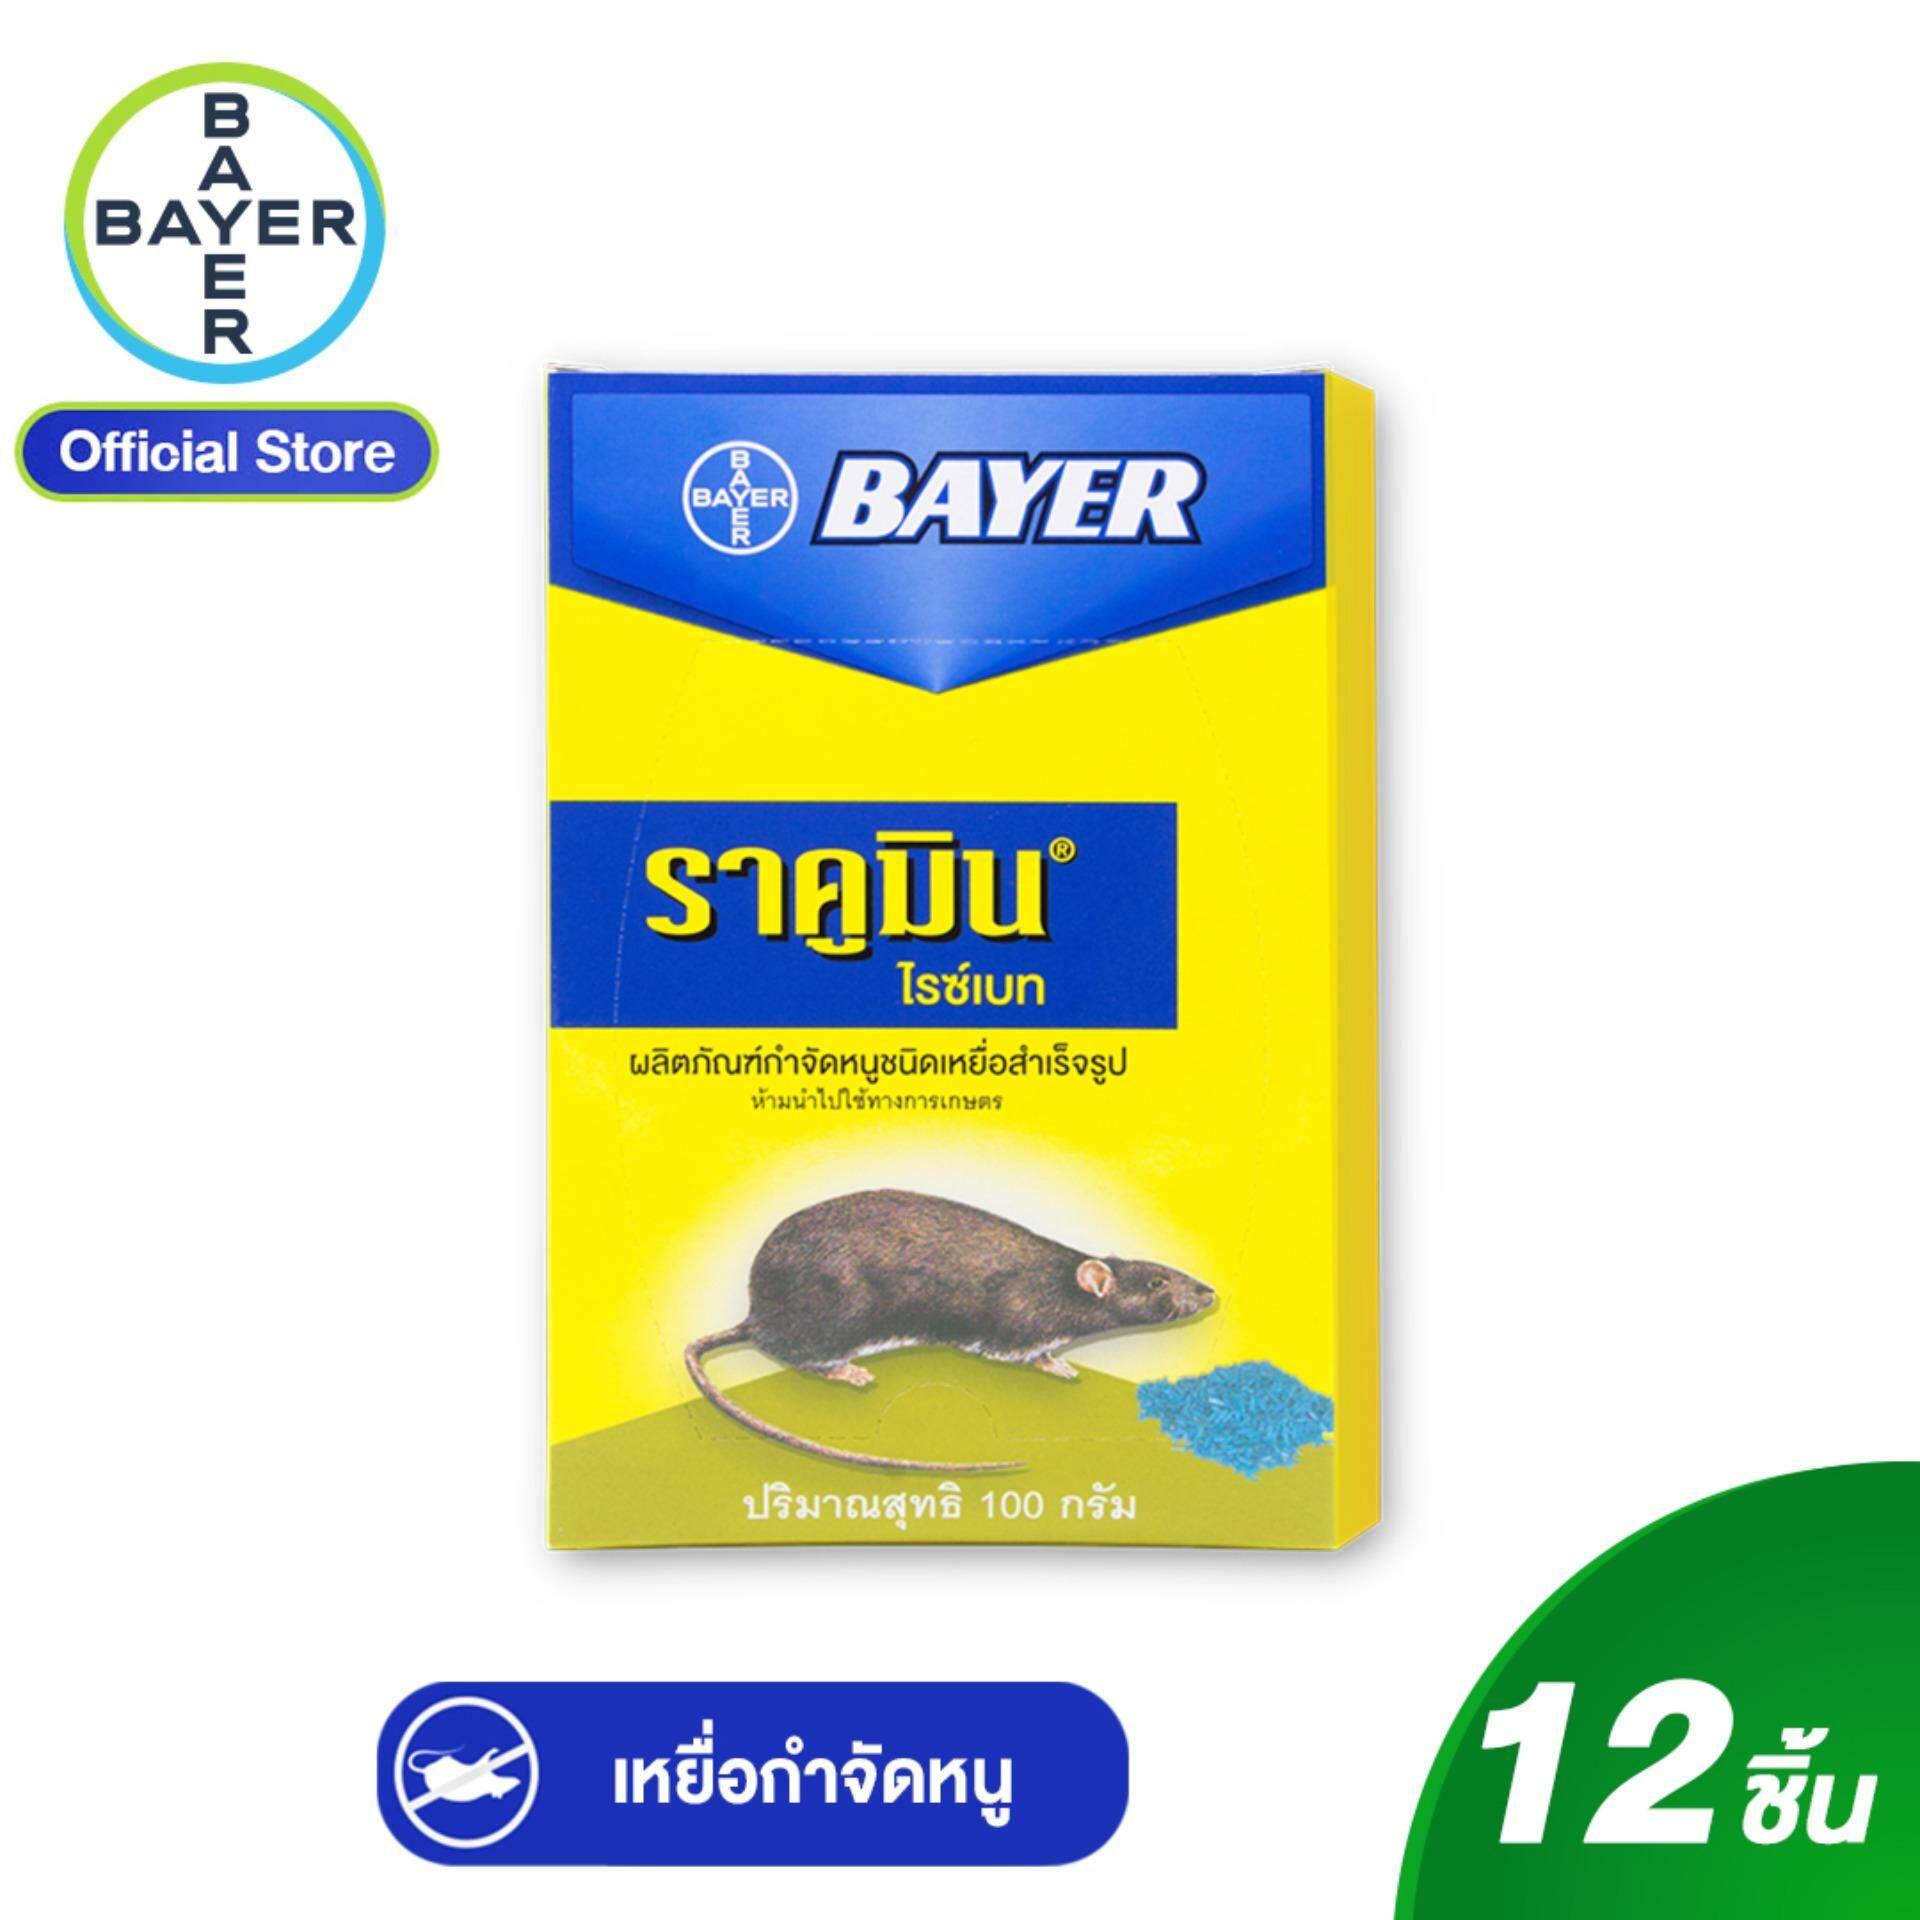 Bayer Racumin Ricebait เหยื่อกำจัดหนู ไบเออร์ ราคูมิน ไรซ์เบท 100 กรัม (แพ็ก12) (เหยื่อกำจัดหนู เหยื่อหนู ยาเบื่อหนู ไล่หนู เหยื่อดักหนู).